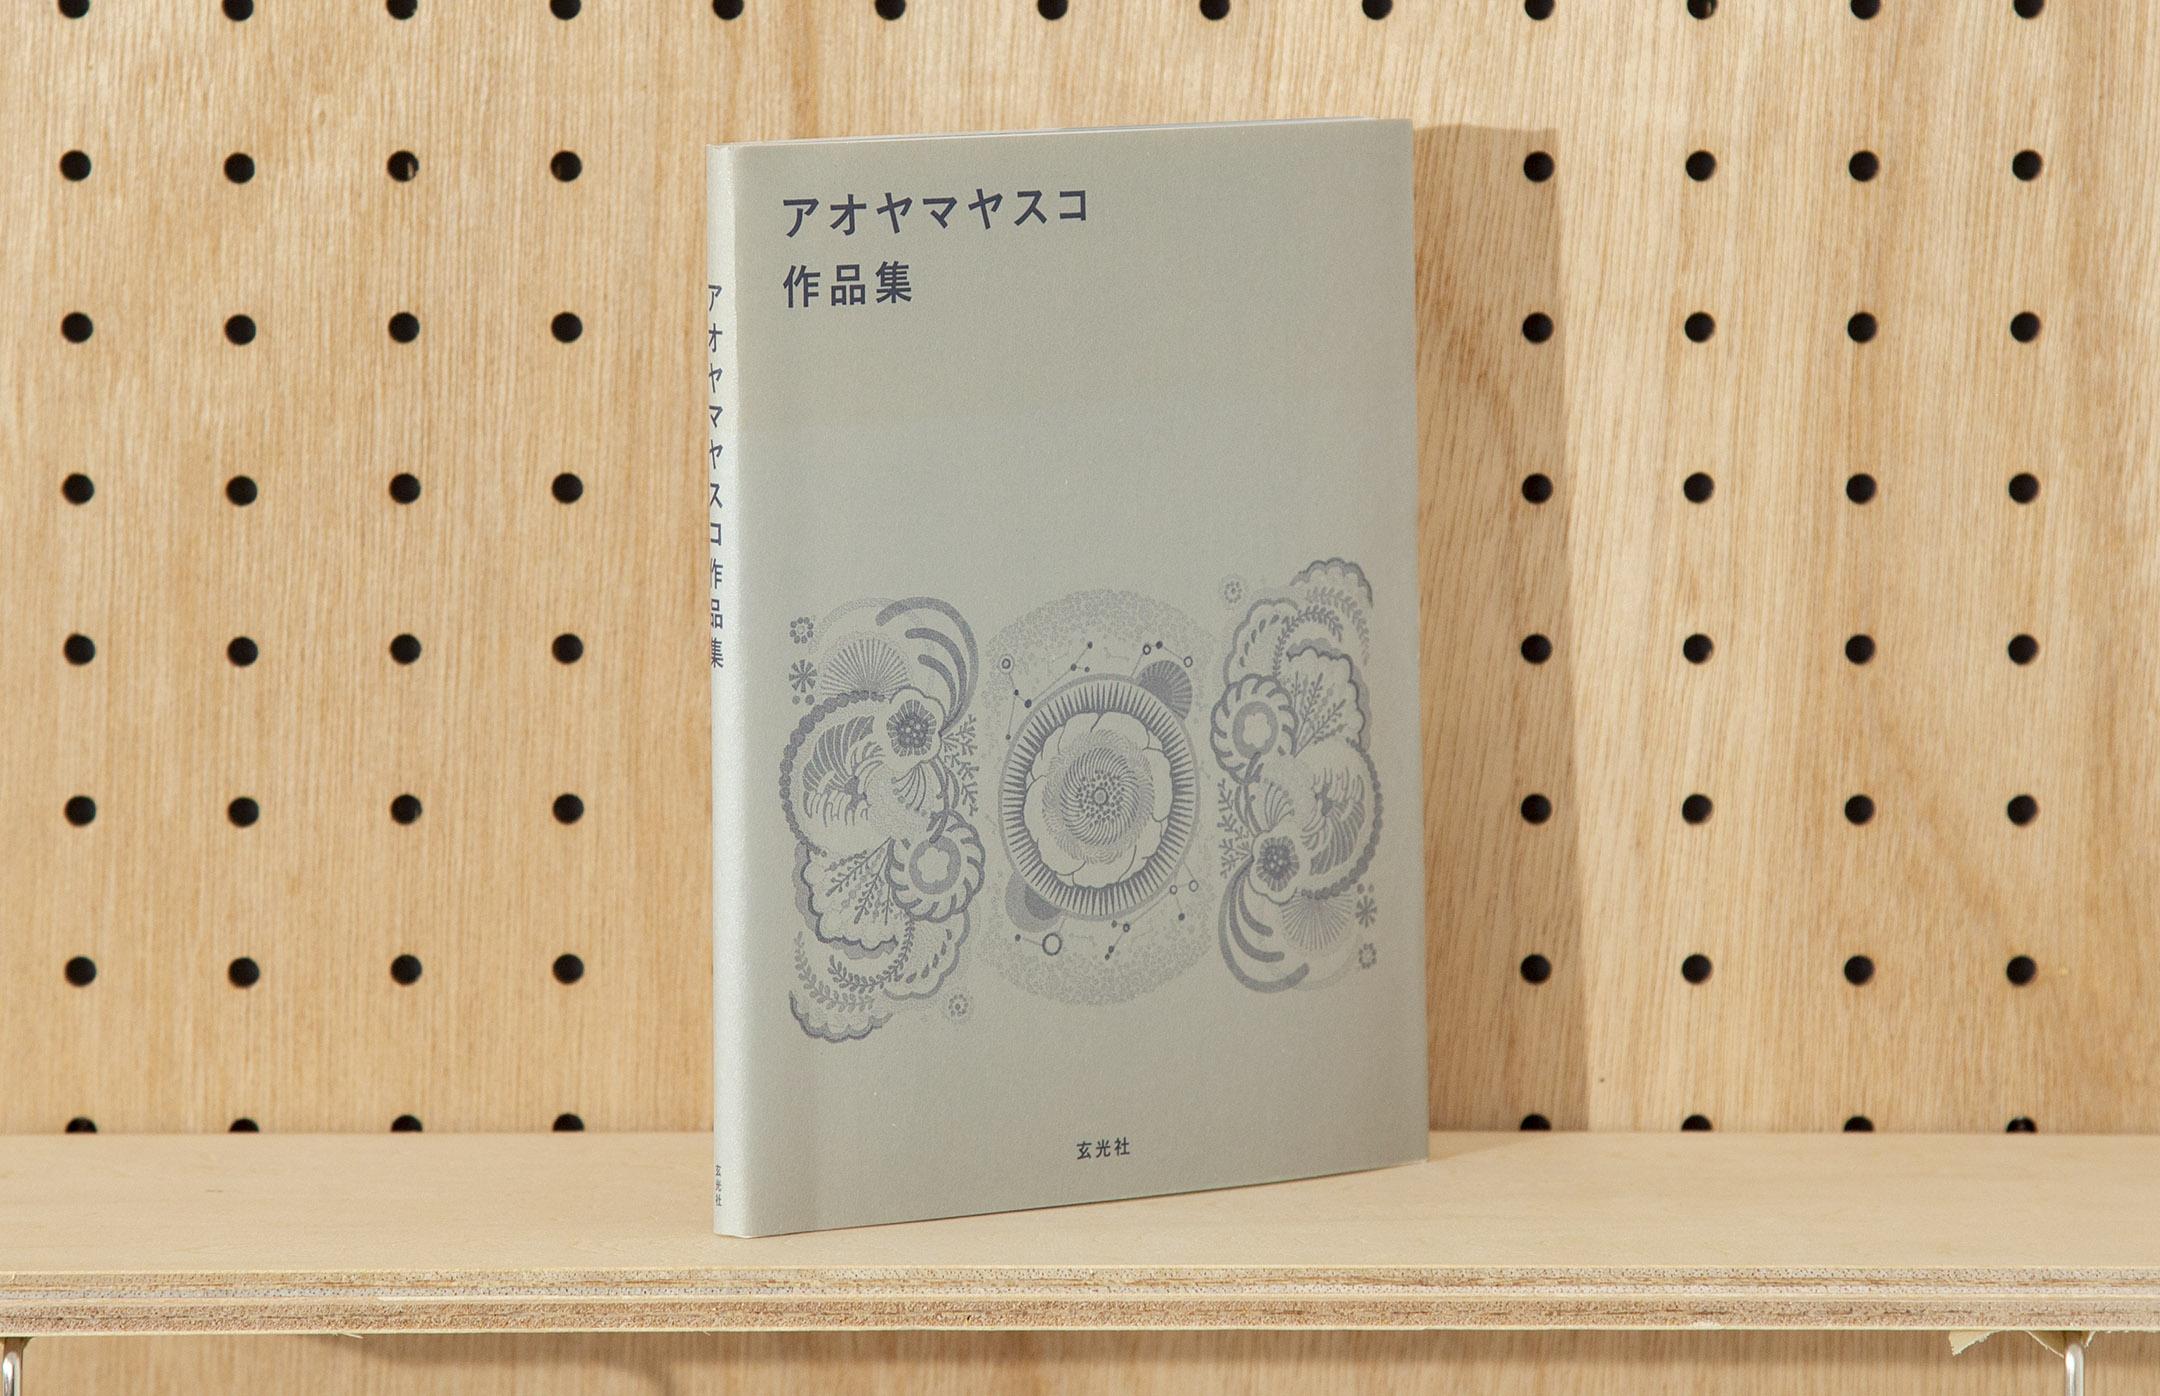 soda design アオヤマヤスコ 作品集